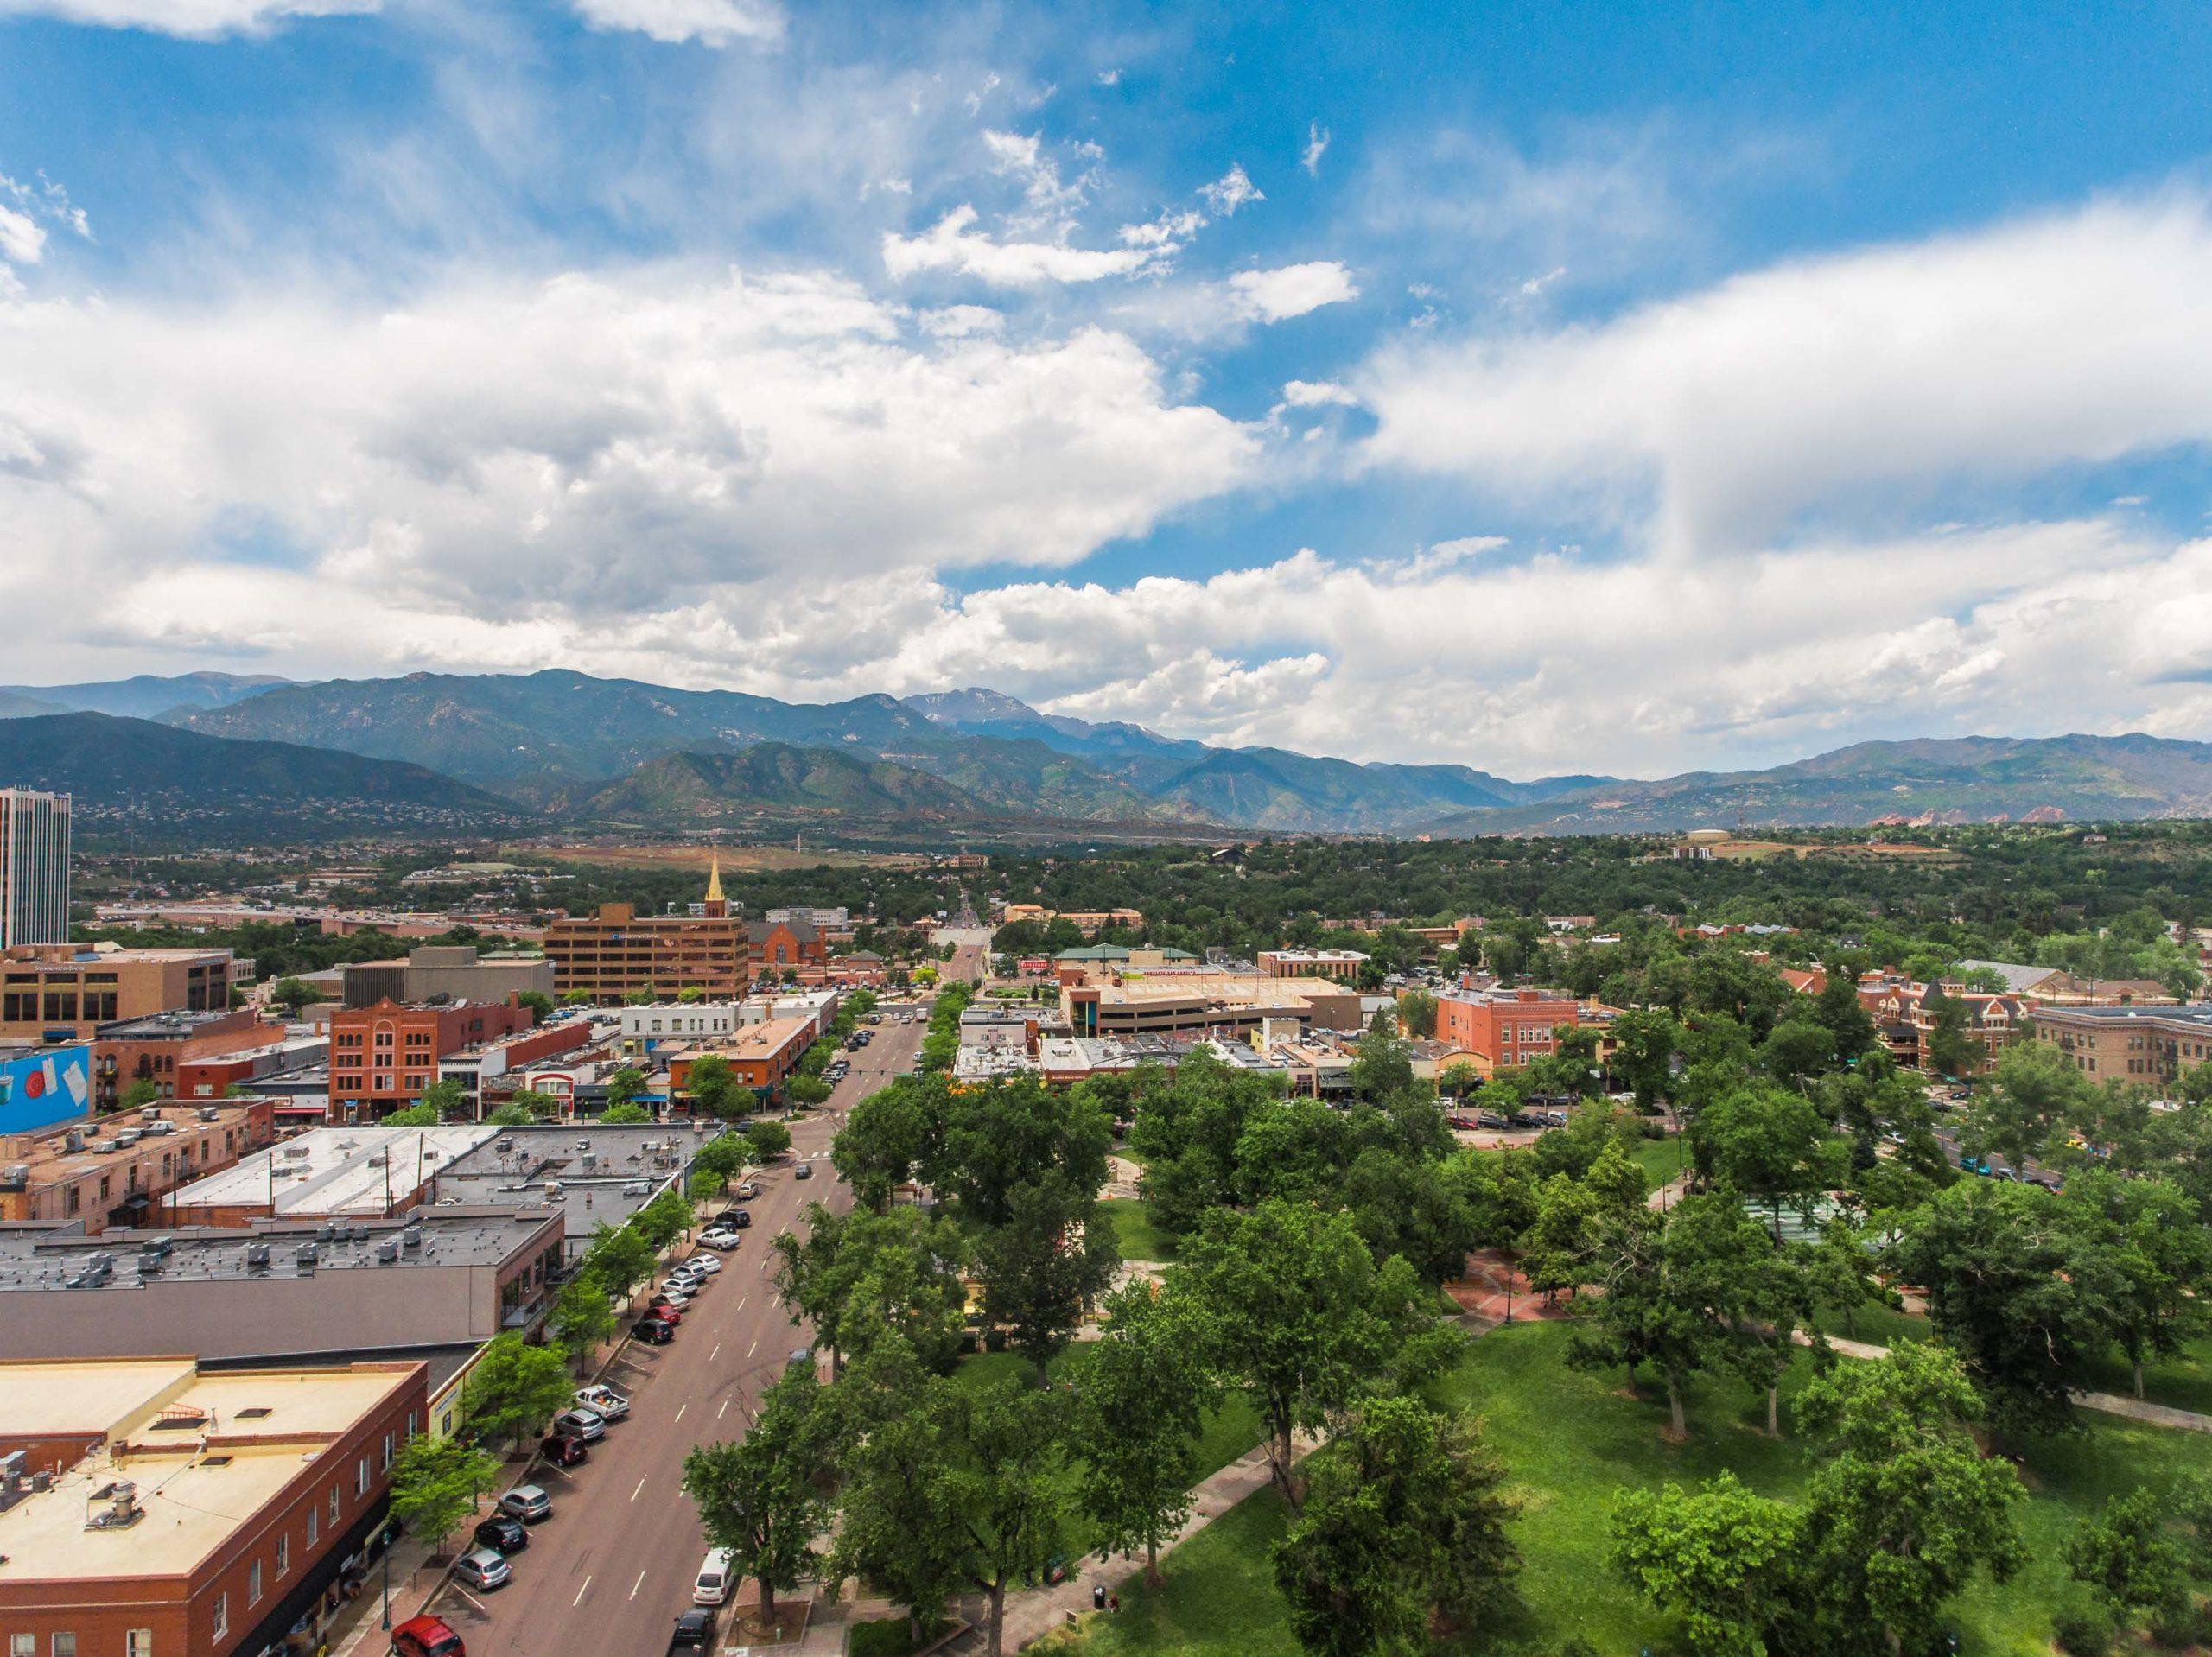 Downtown Colorado Springs in 2019.